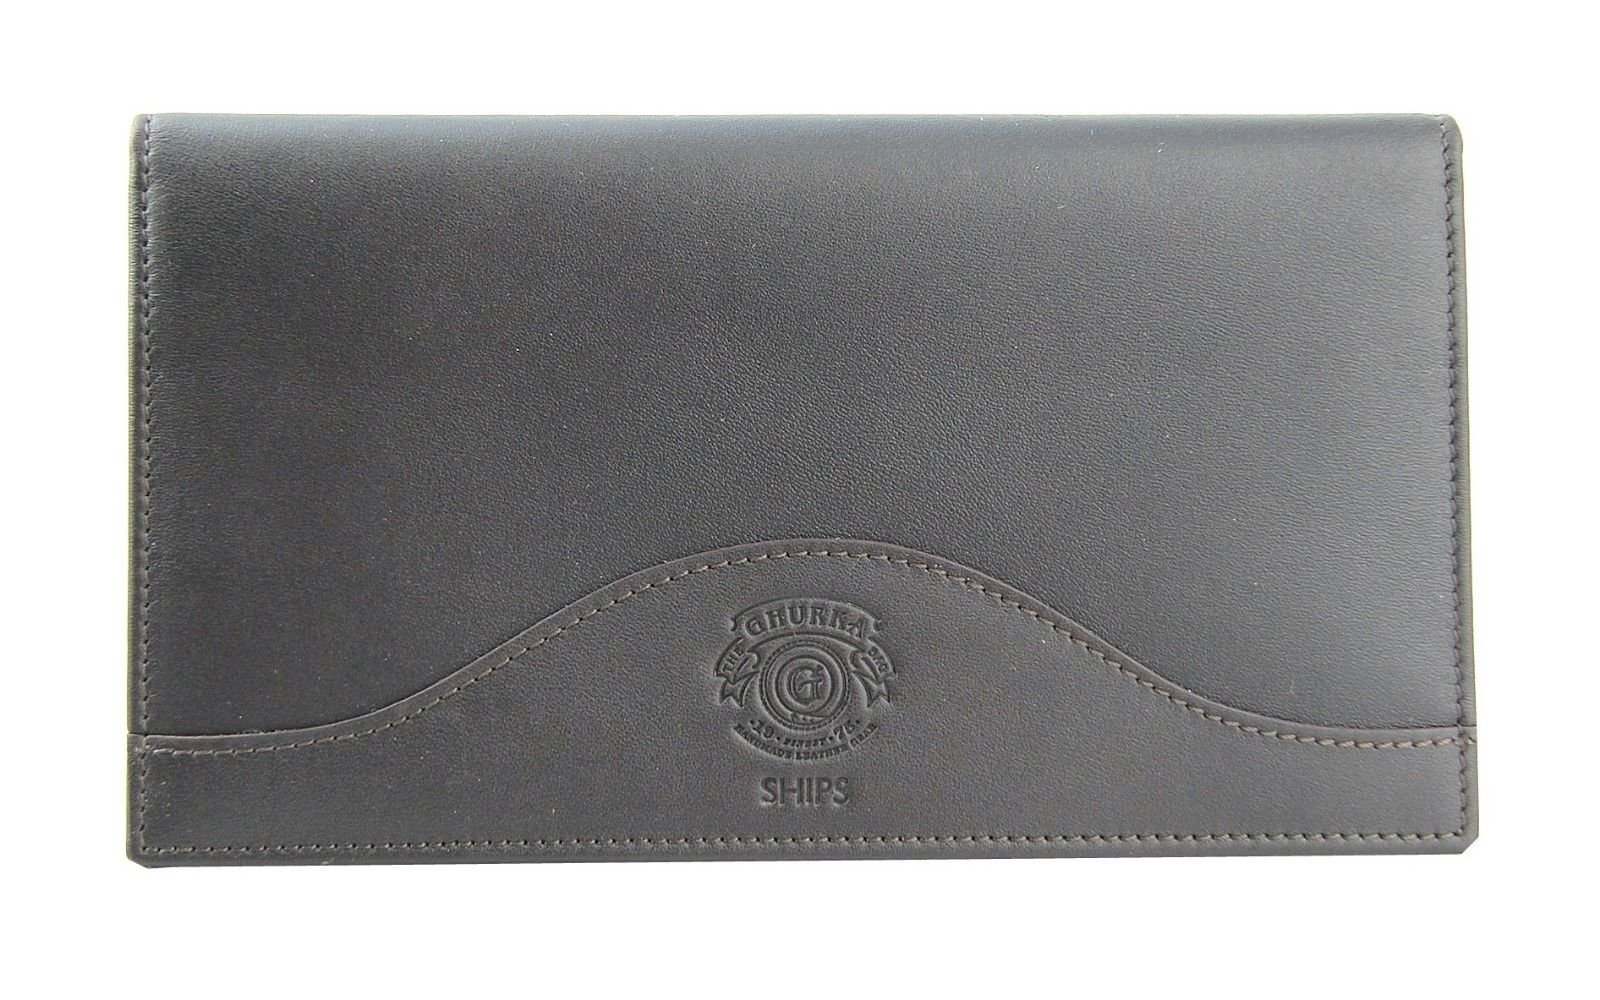 GHURKA 100% LEATHER PASSPORT WALLET 11 CREDIT CARD WALNUT BRAND NEW #1